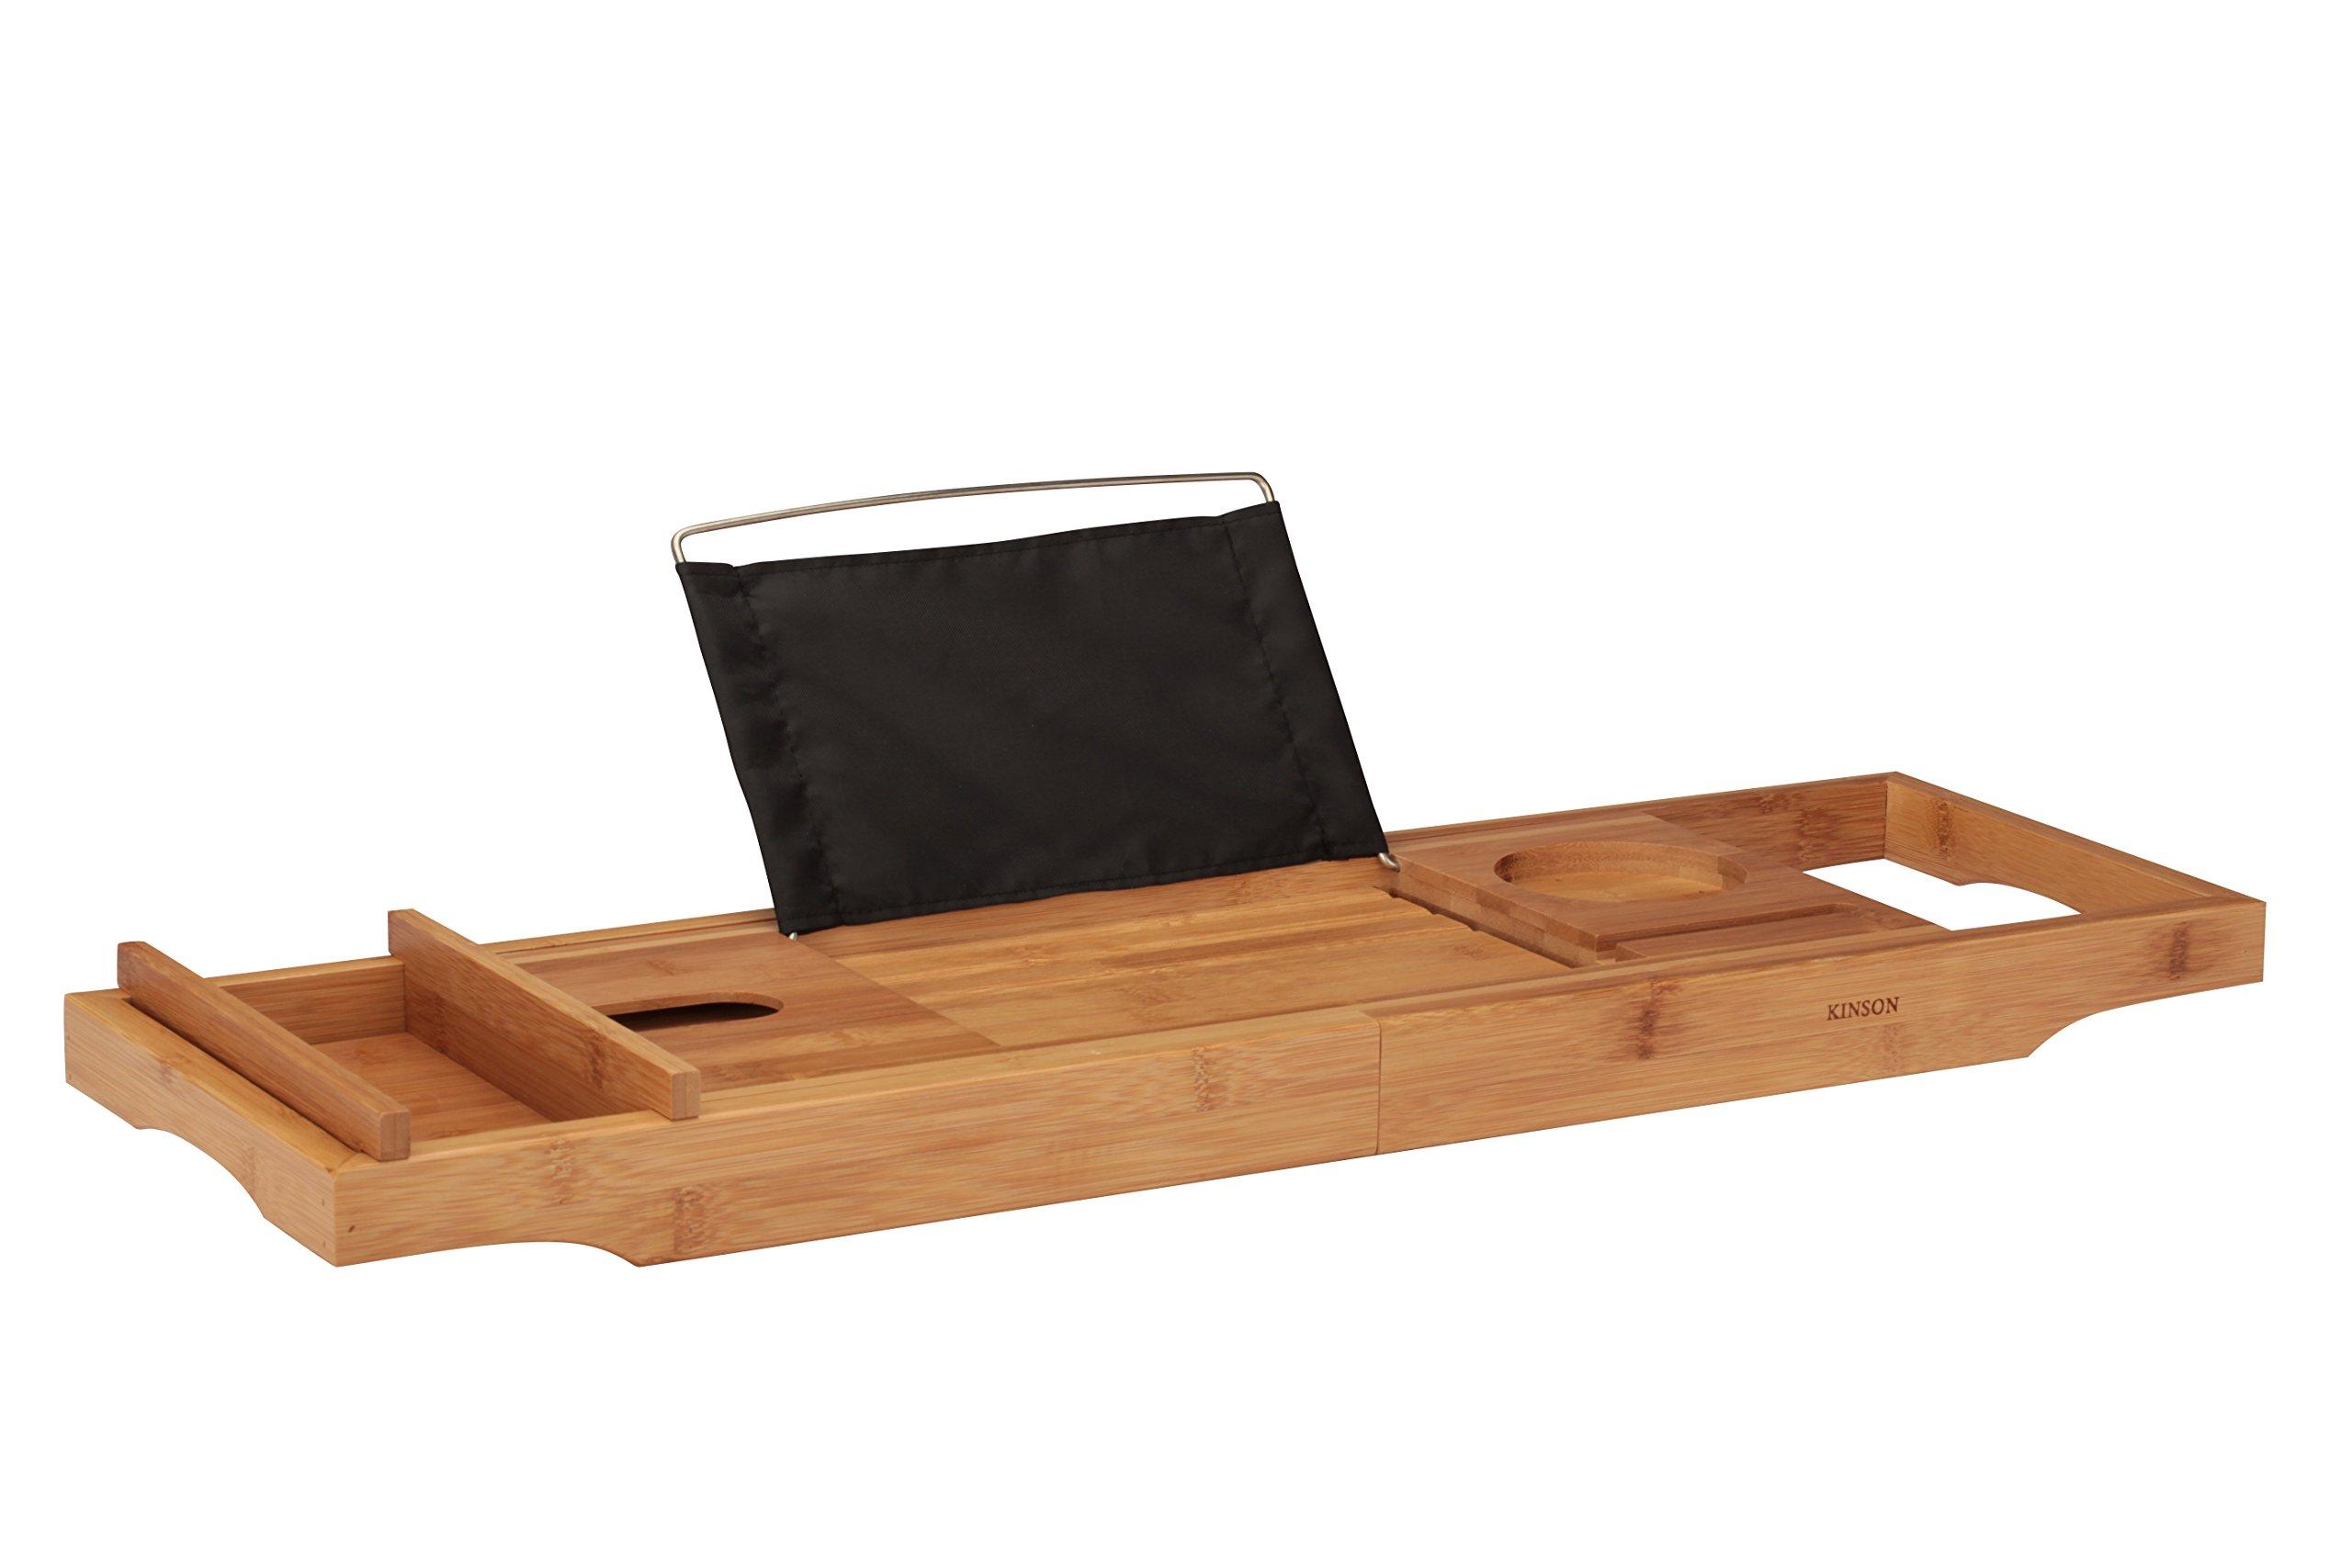 KINSON Bamboo Bathtub Caddy Tray